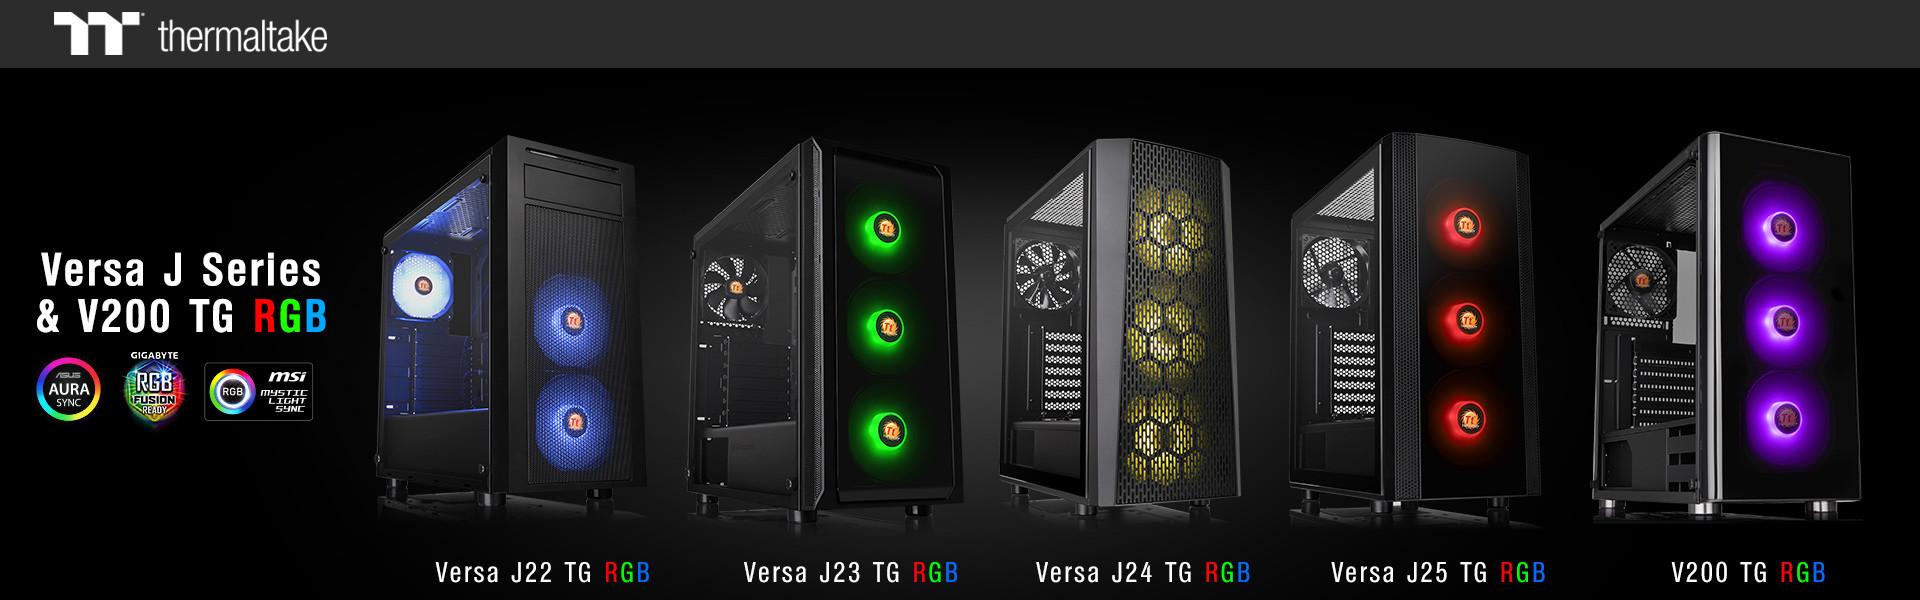 Thermaltake Unveils Versa J Series & V200 TG Cases | TechPowerUp